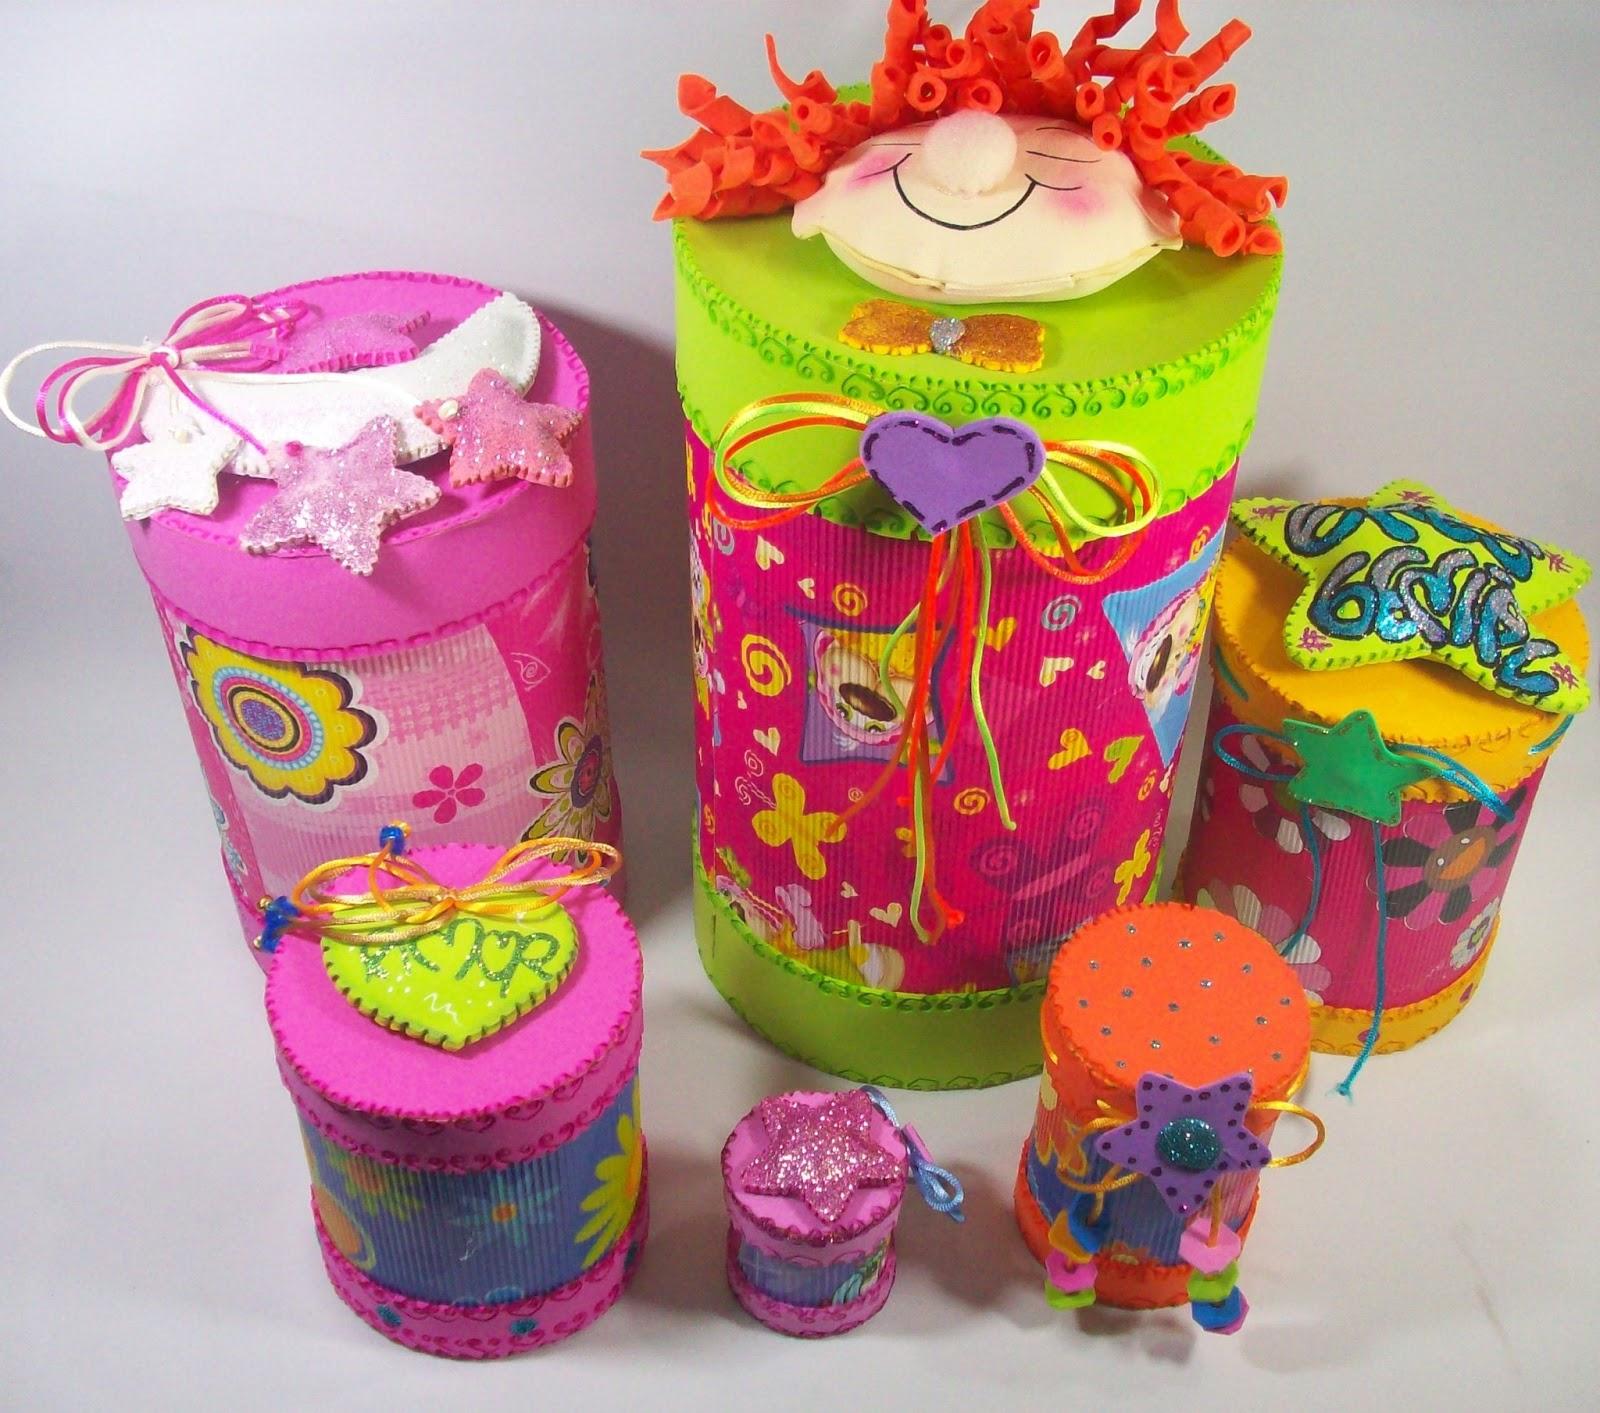 Tarritos decorados con goma eva decoraci 243 n de tarros for Botes de cocina decorados con goma eva